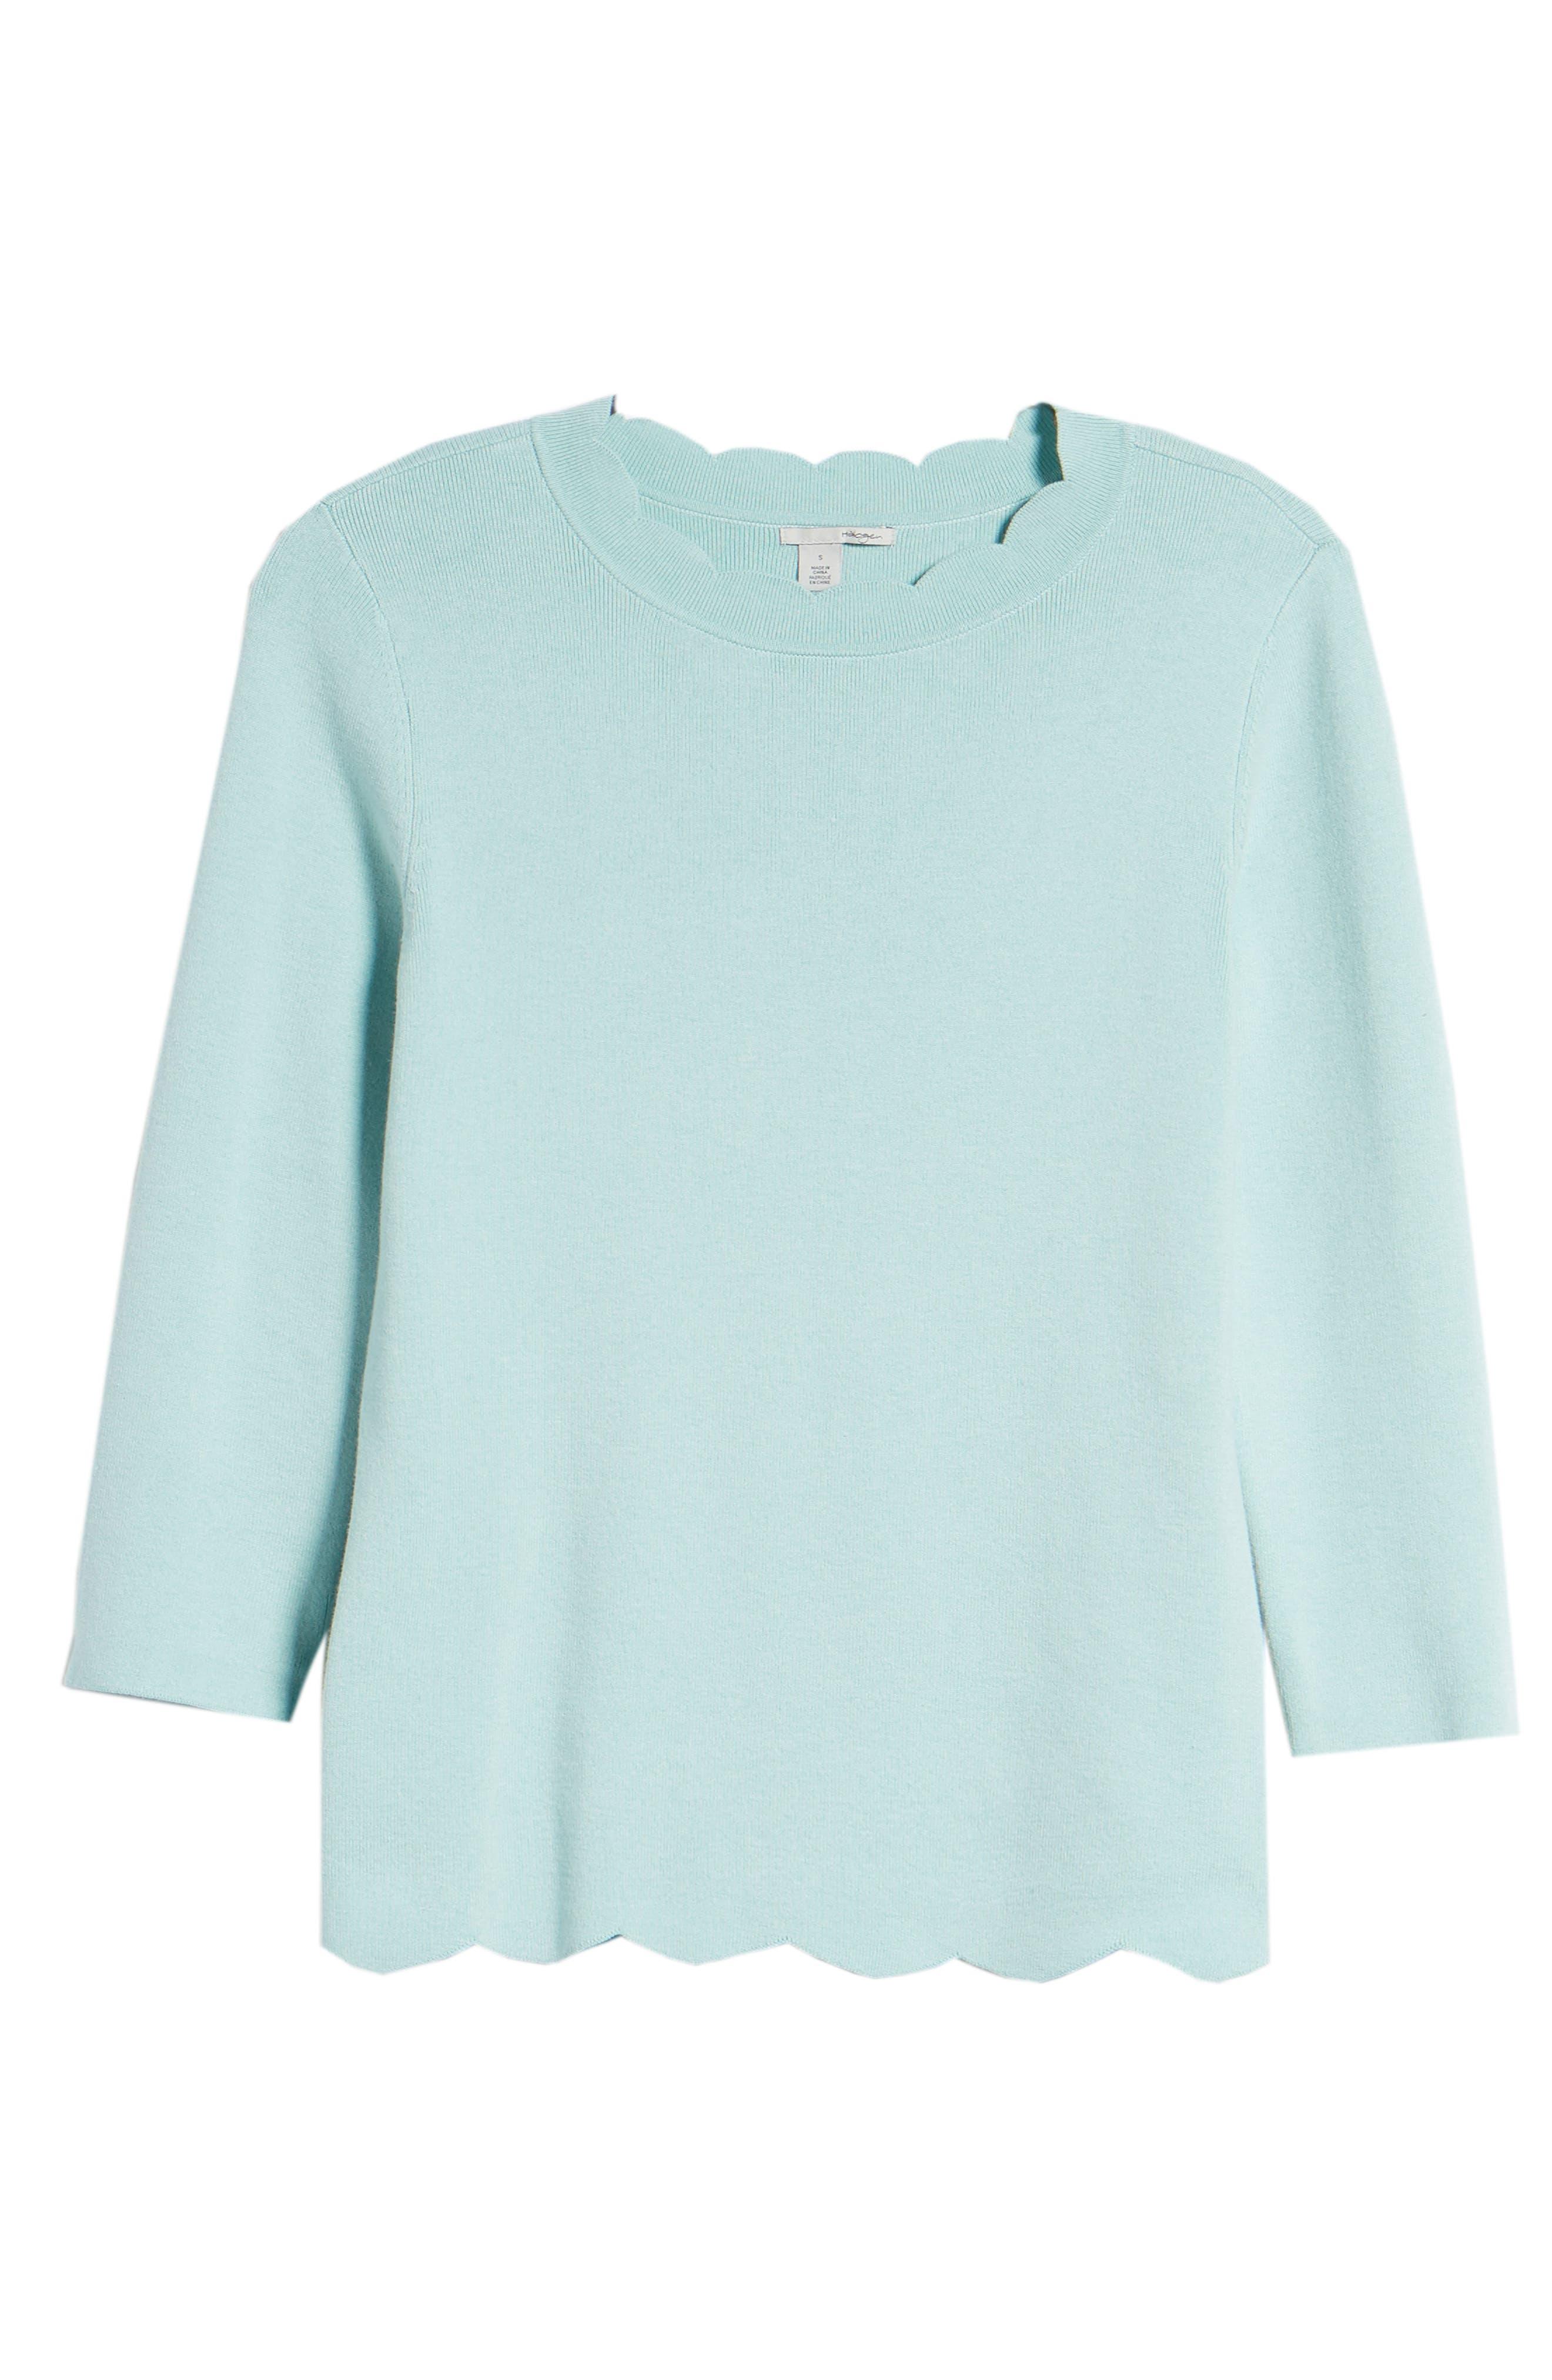 Halogen Scallop Edge Sweater,                             Alternate thumbnail 6, color,                             Blue Resort